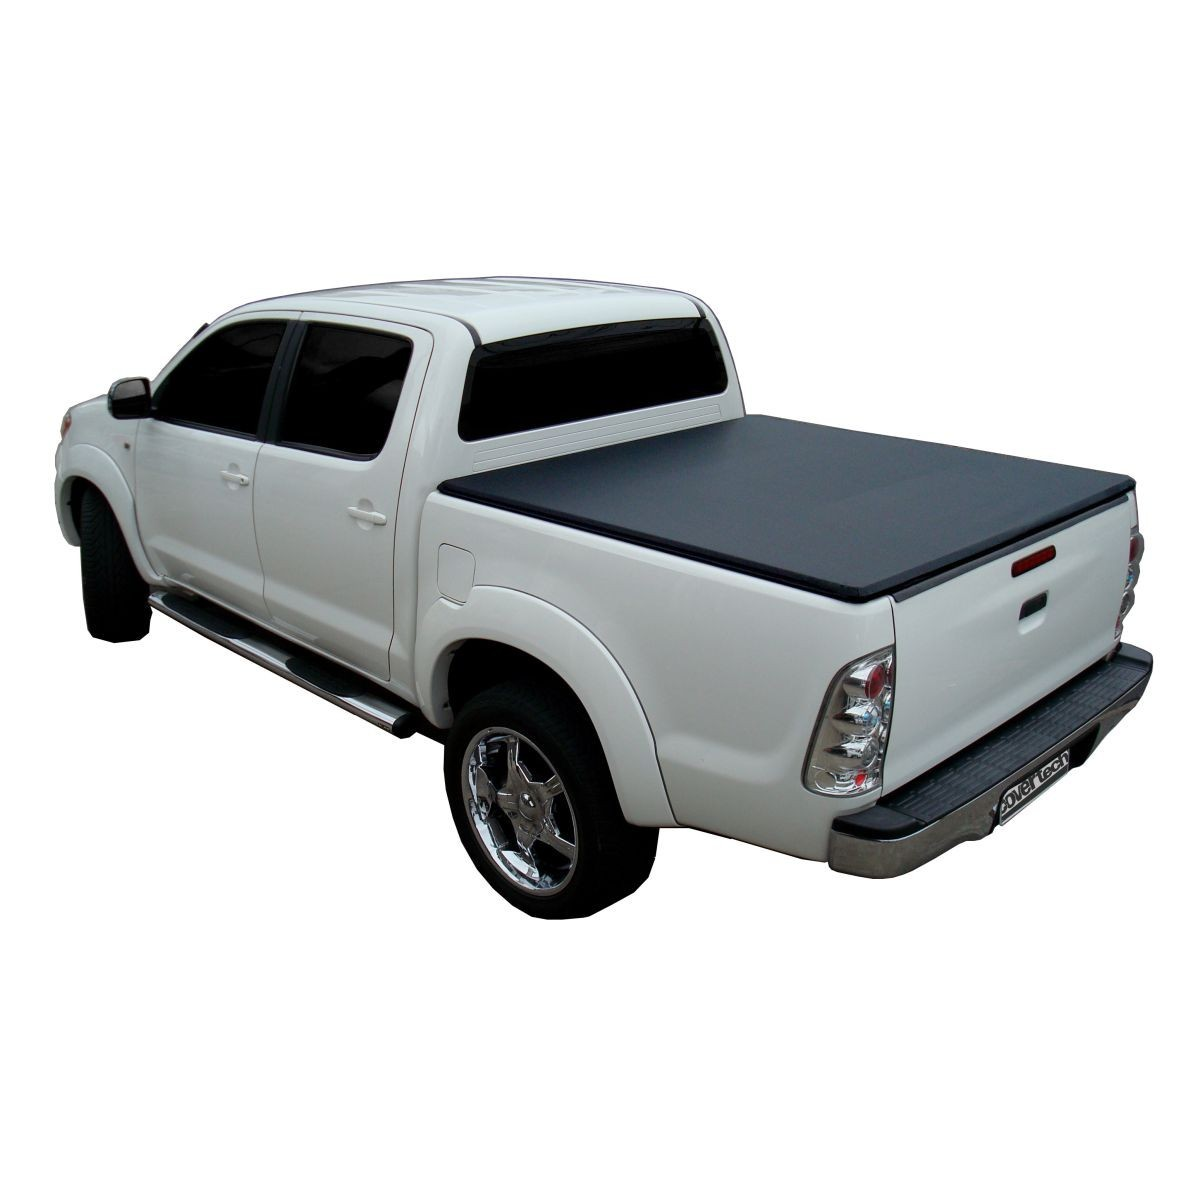 carpa plana para pick up y camionetas toyota hilux. Black Bedroom Furniture Sets. Home Design Ideas